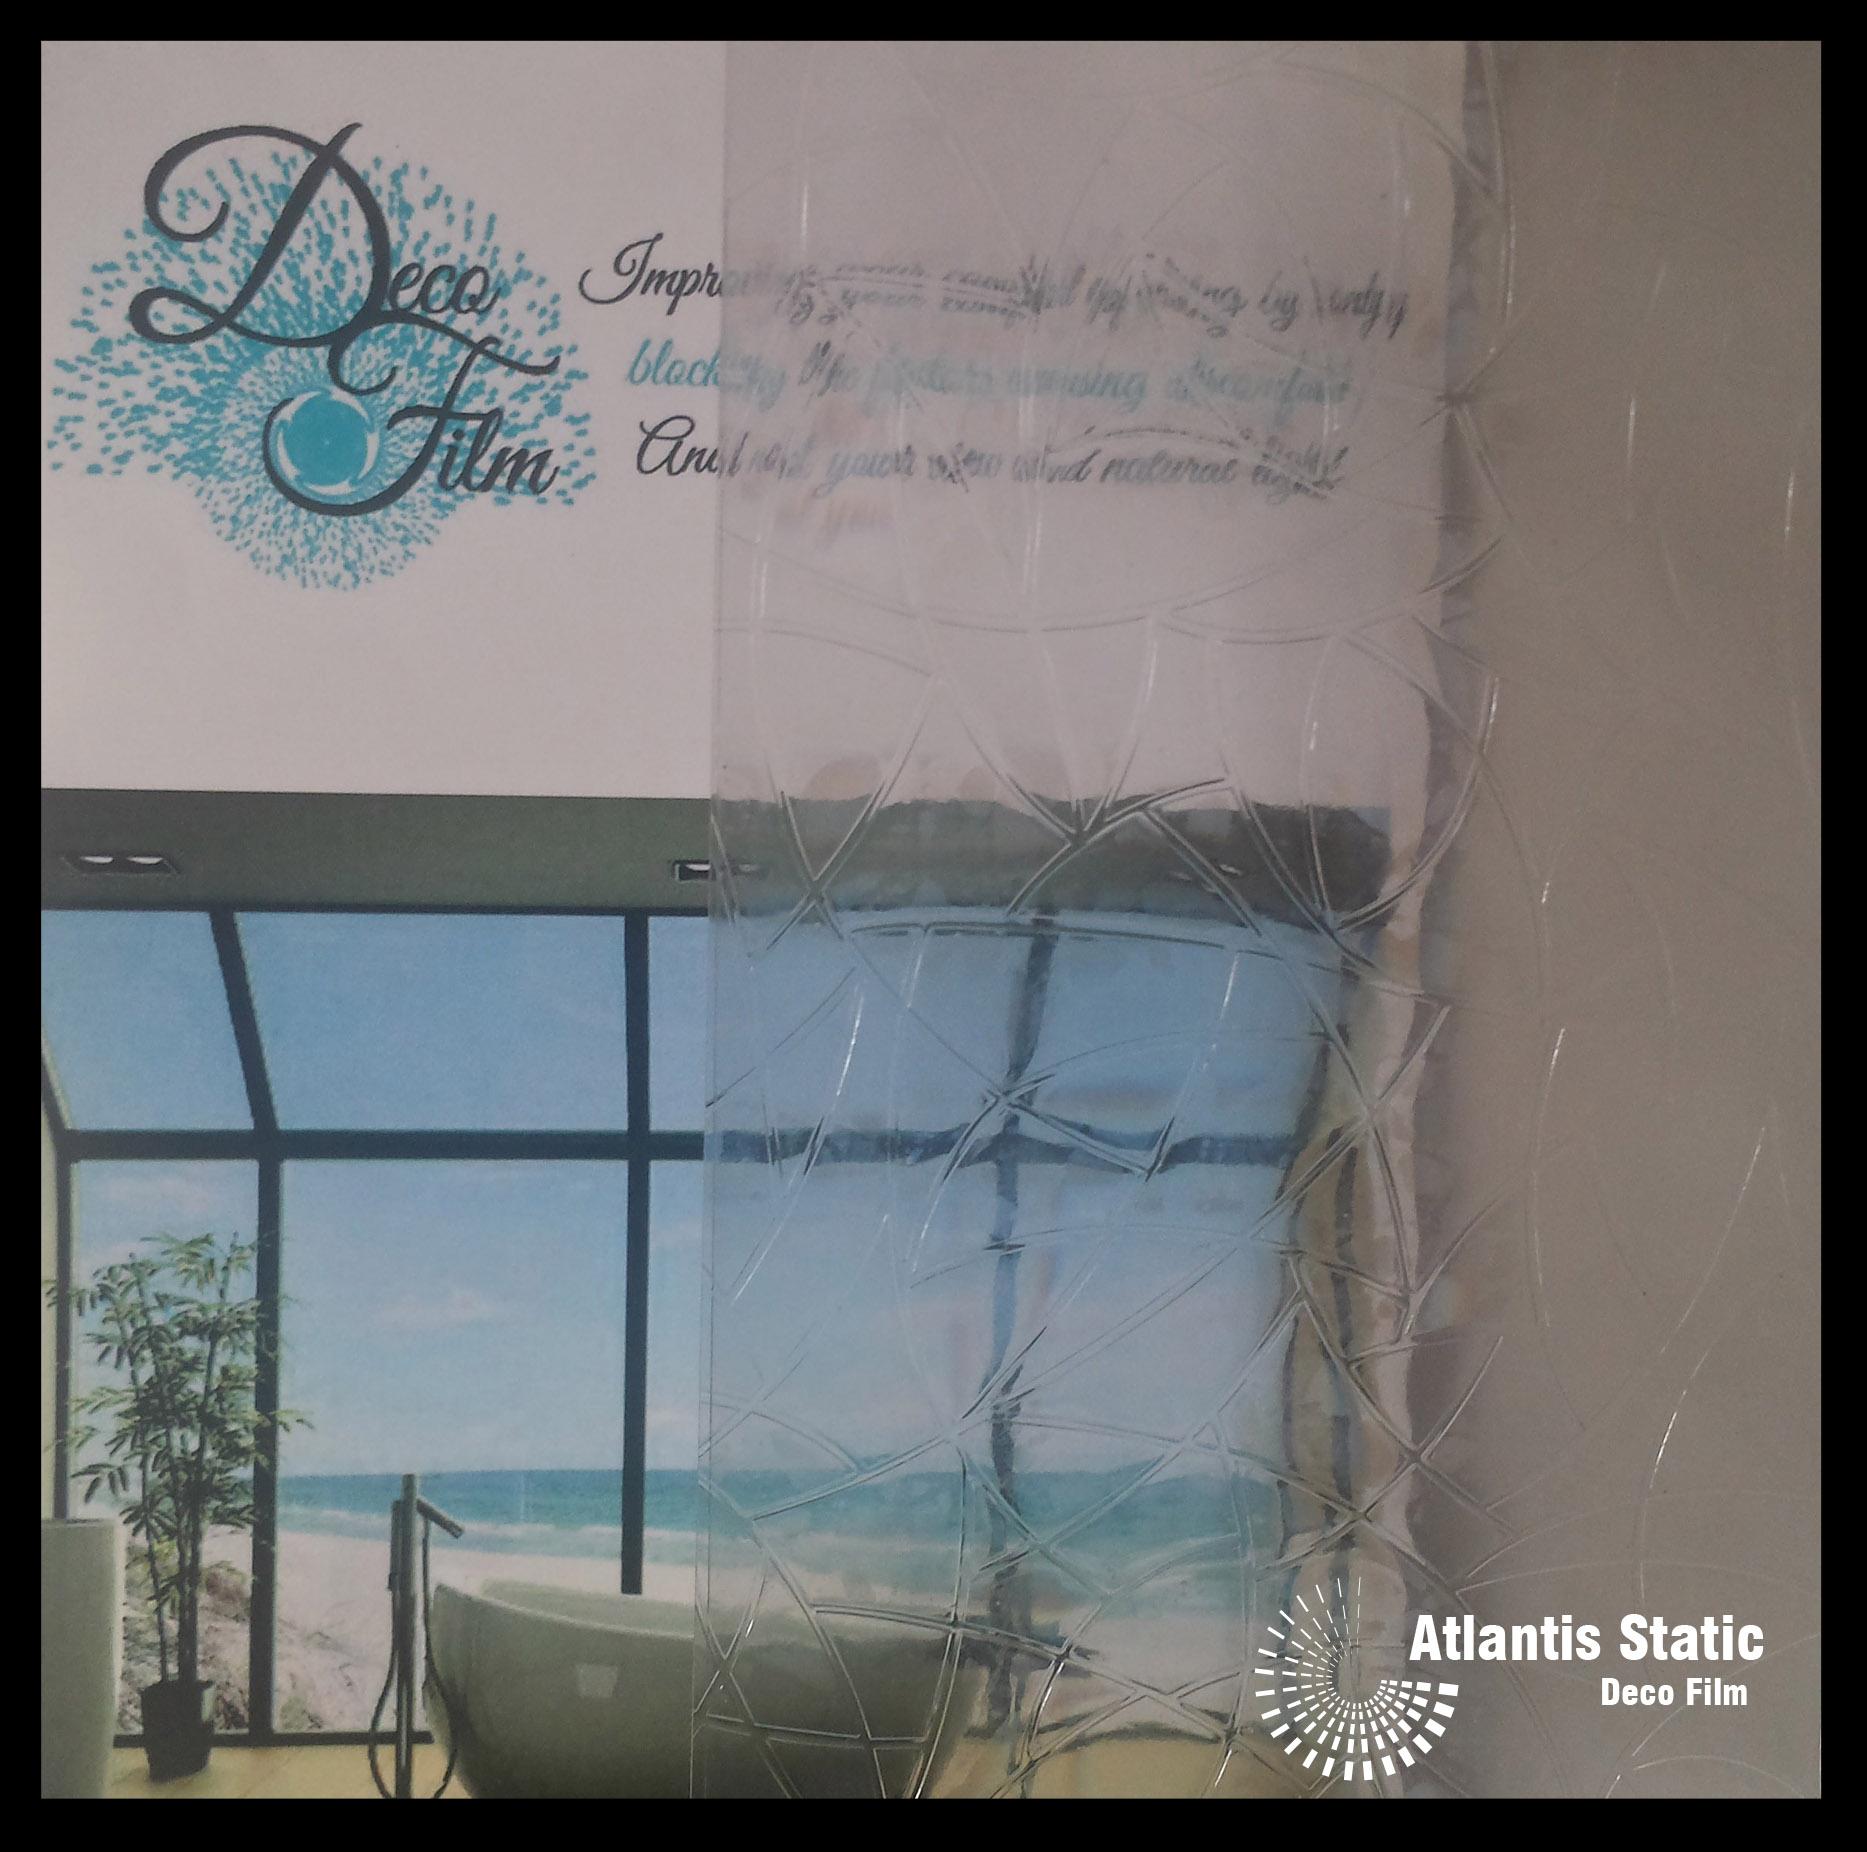 Atlantis Static